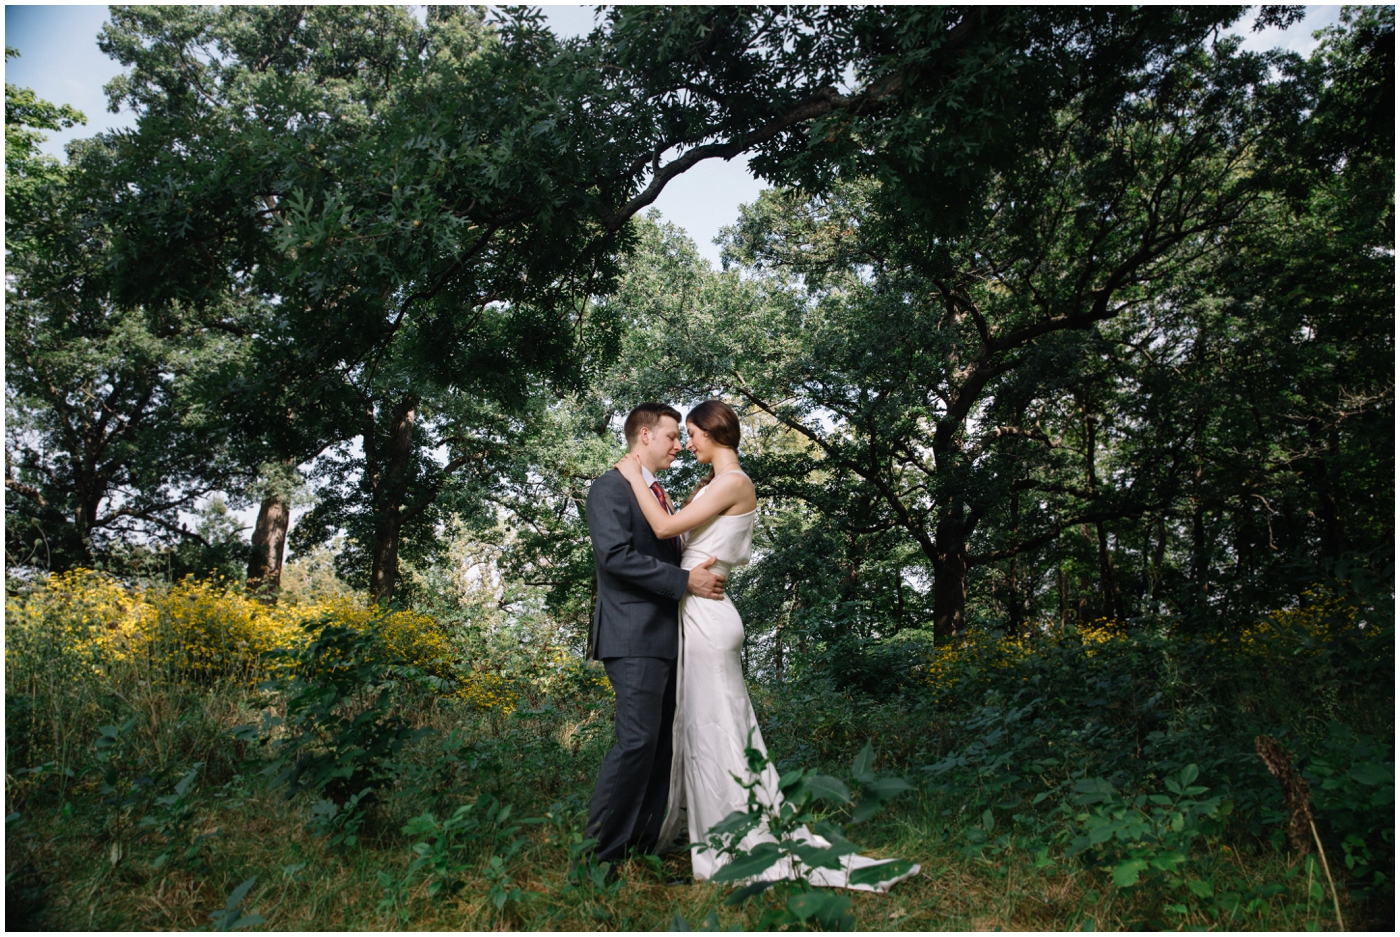 indianapolis_wedding_photographer-1.jpg